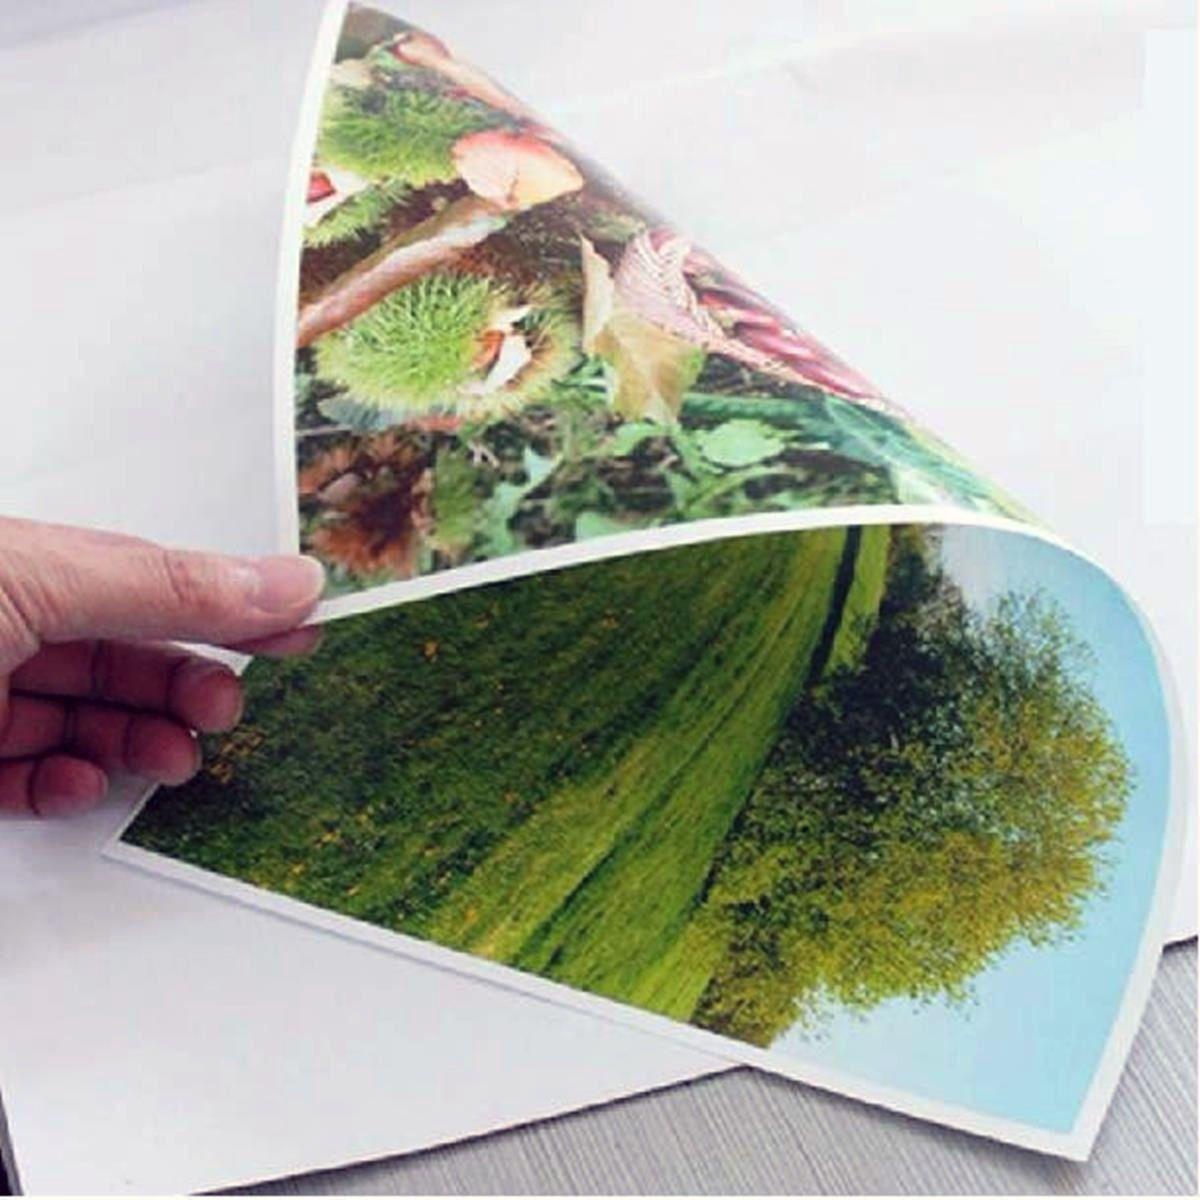 Papel Fotográfico A4 Dupla Face 220g Glossy Branco Brilhante Resistente à Água / 500 folhas